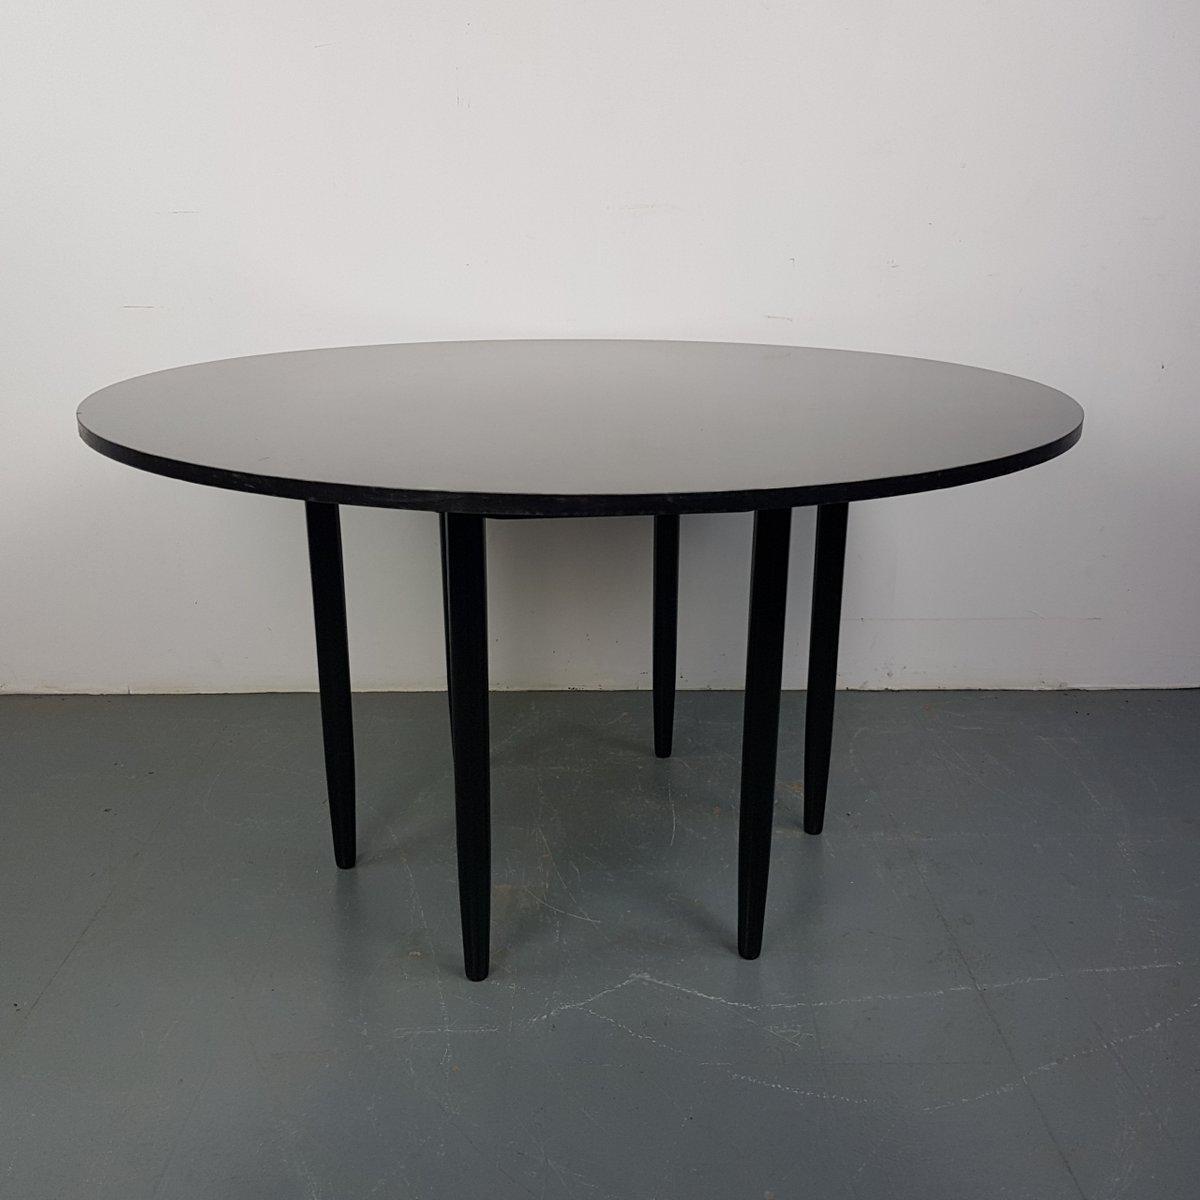 table ronde vintage noire 1960s en vente sur pamono. Black Bedroom Furniture Sets. Home Design Ideas